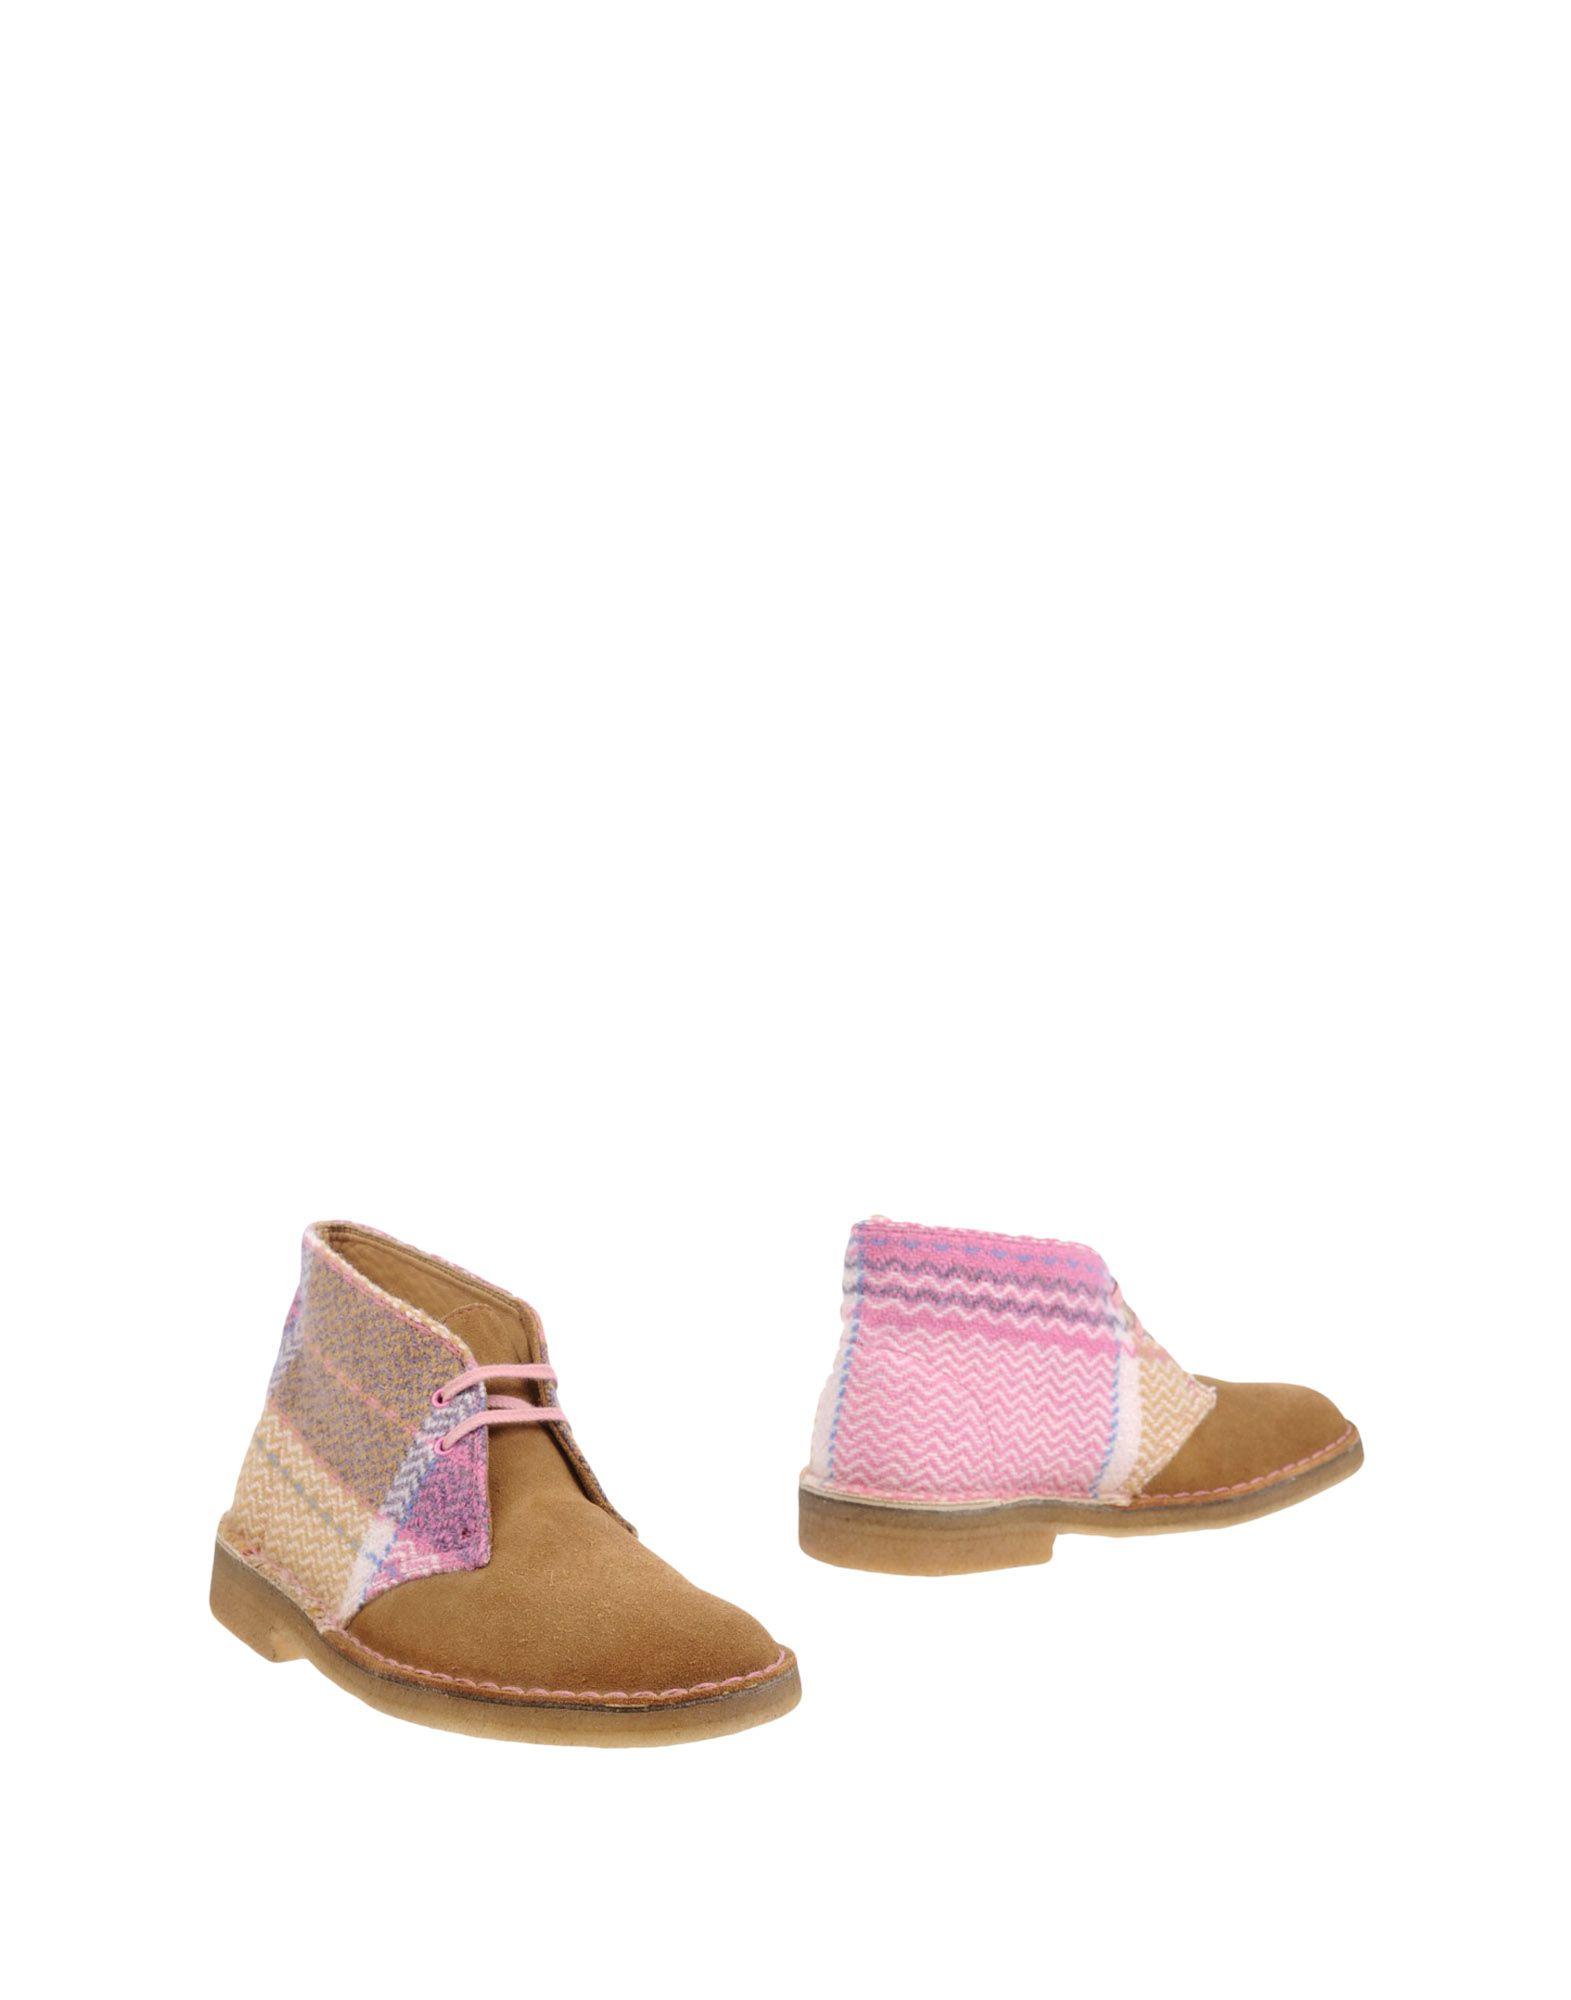 CLARKS ORIGINALS Ankle Boot in Camel